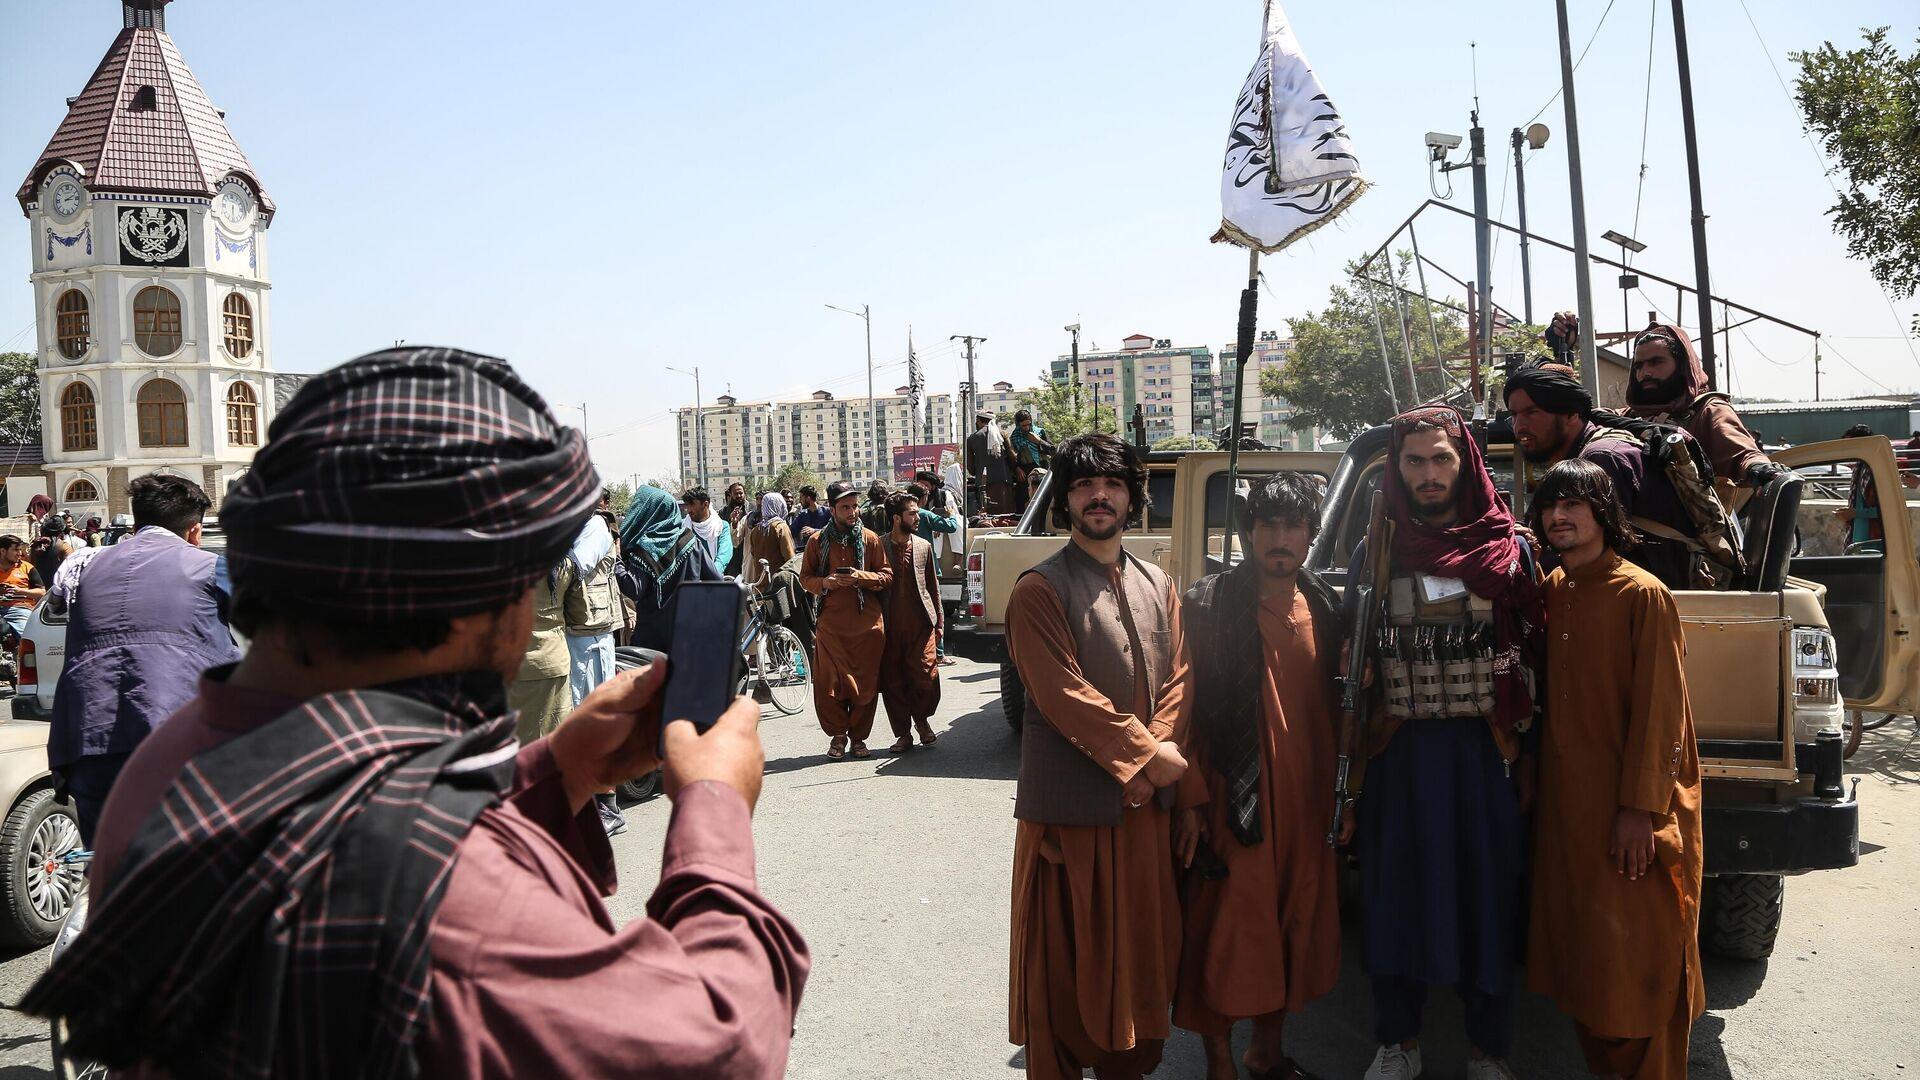 Combattenti talebani* (organizzazione terroristica bandita in Russia ed in altri paesi) a Kabul - Sputnik Italia, 1920, 20.08.2021